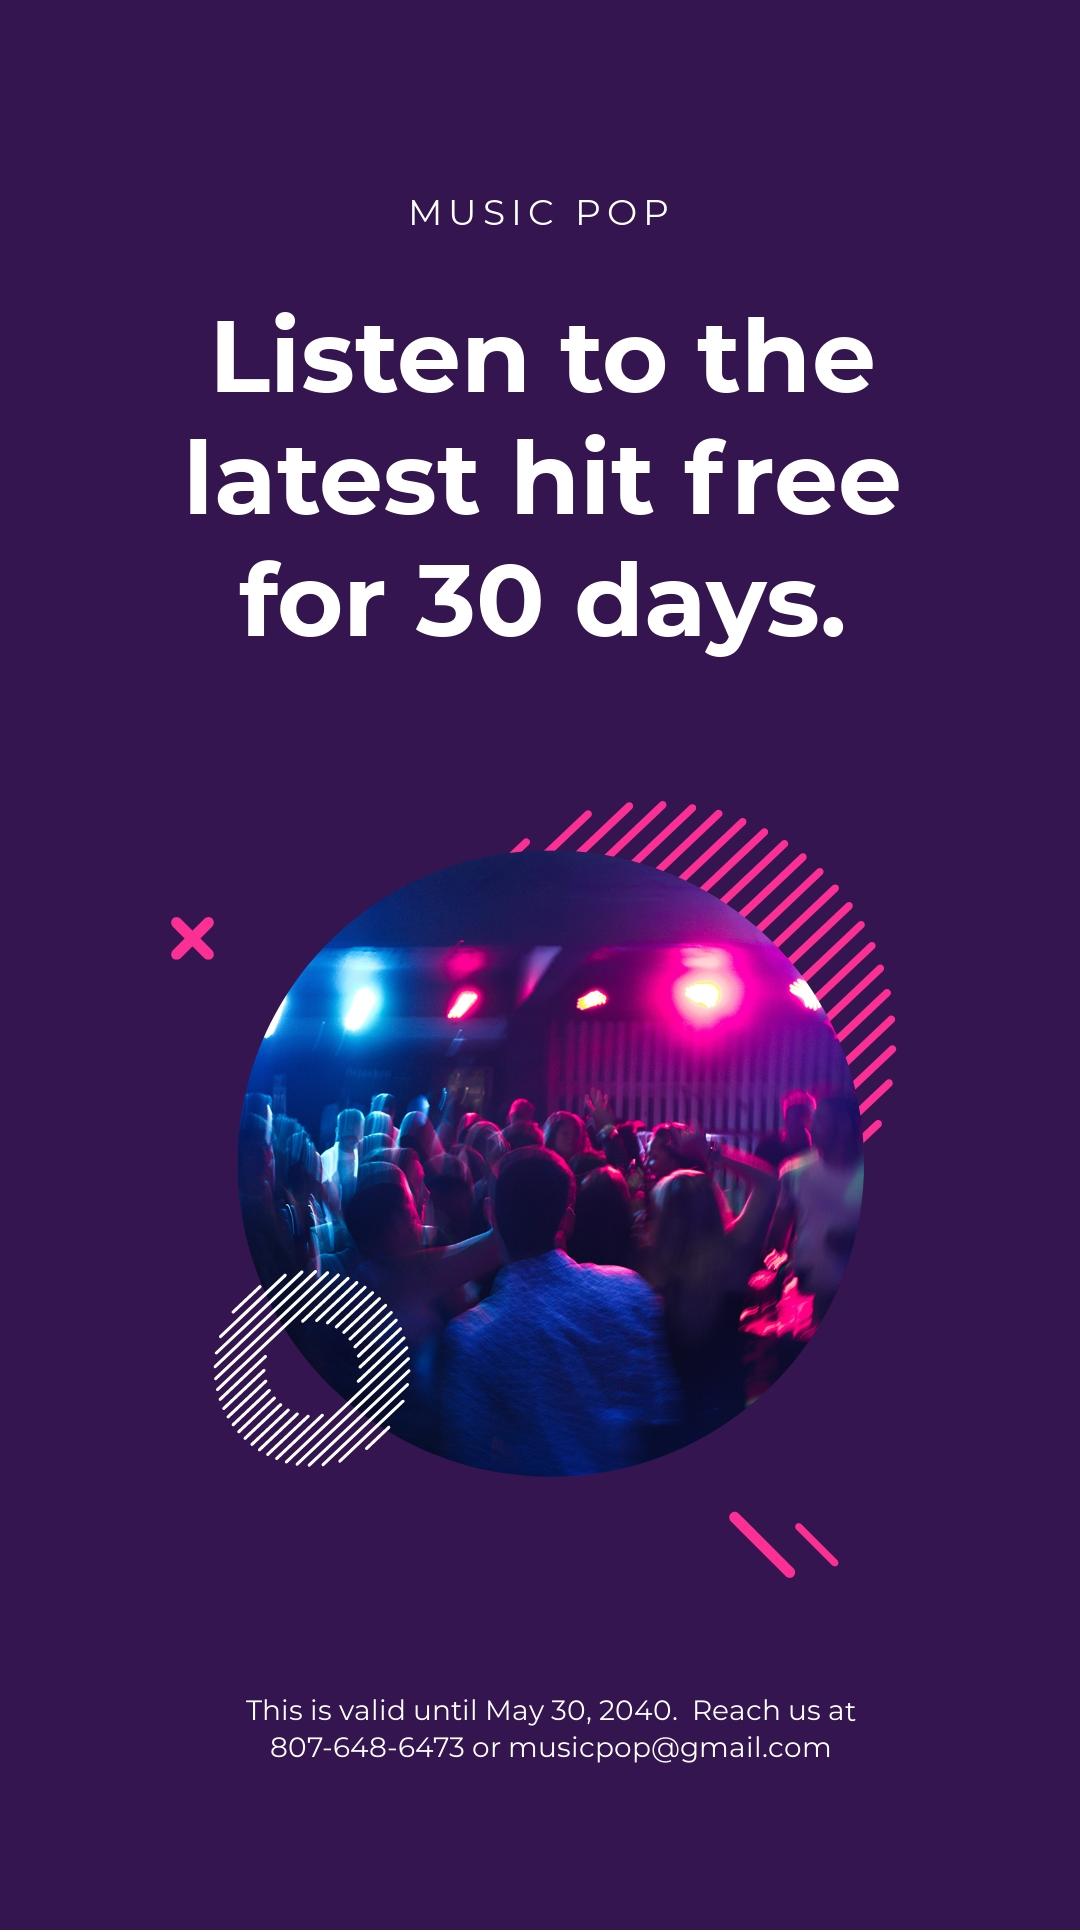 Modern Music App Promotion Instagram Story Template